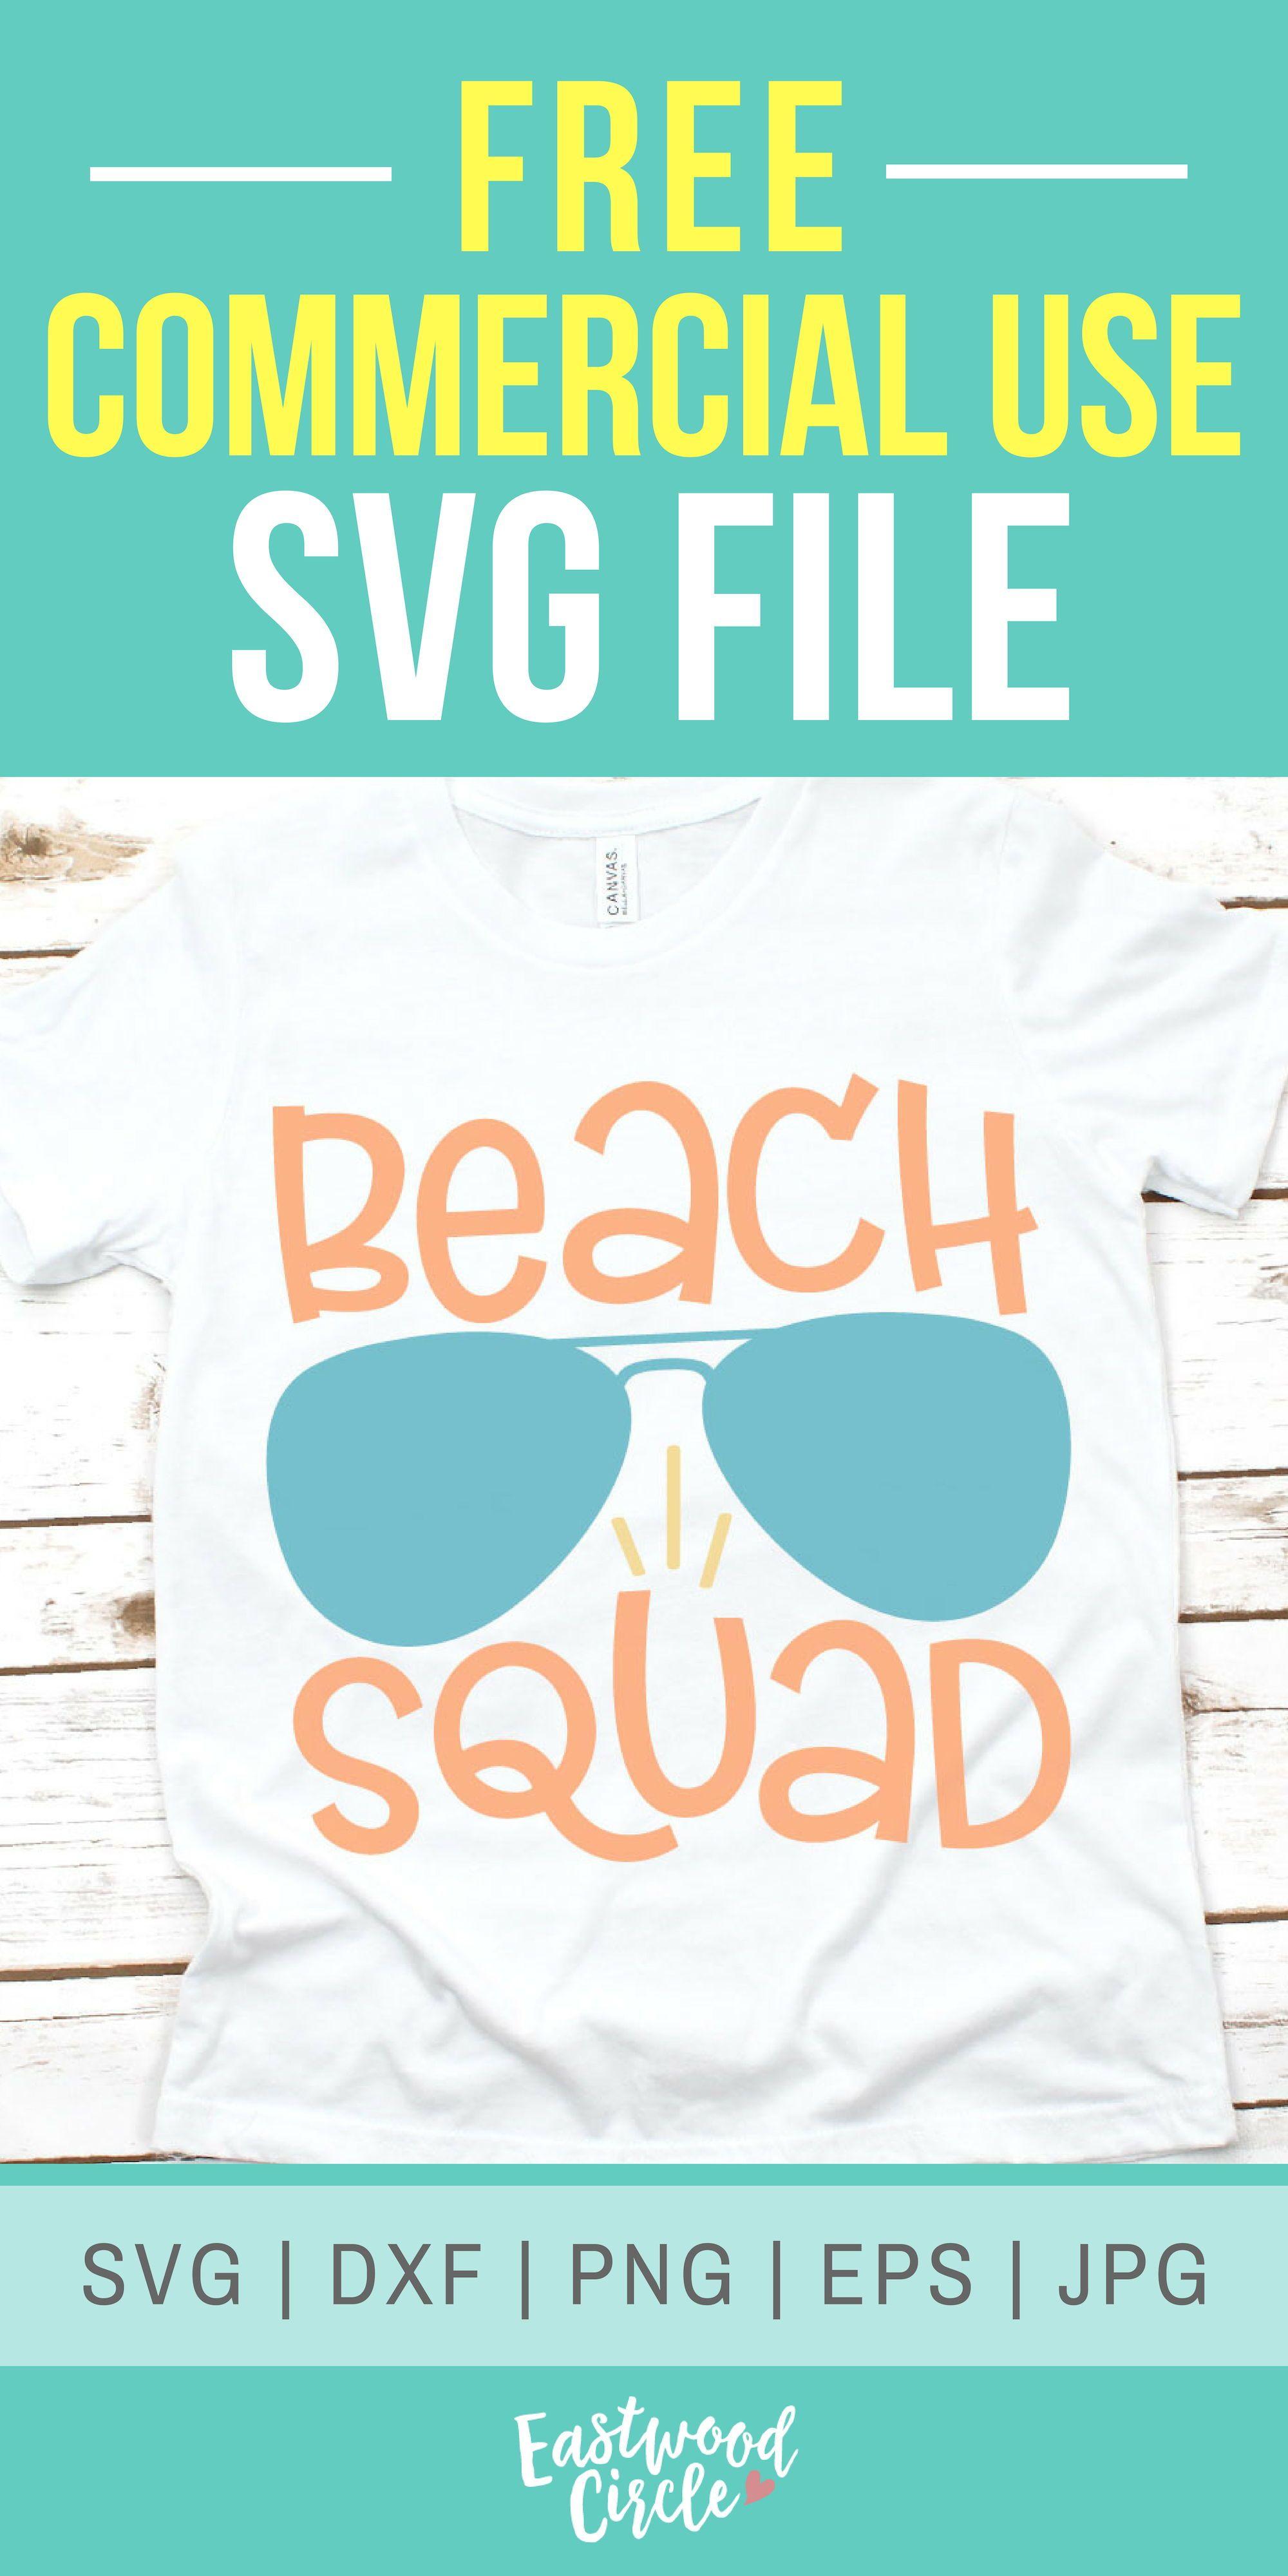 Beach Squad Svg Beach Svg Beach Svg Files For Cricut Beach Etsy Svg Files For Cricut Svg Beach Shirts